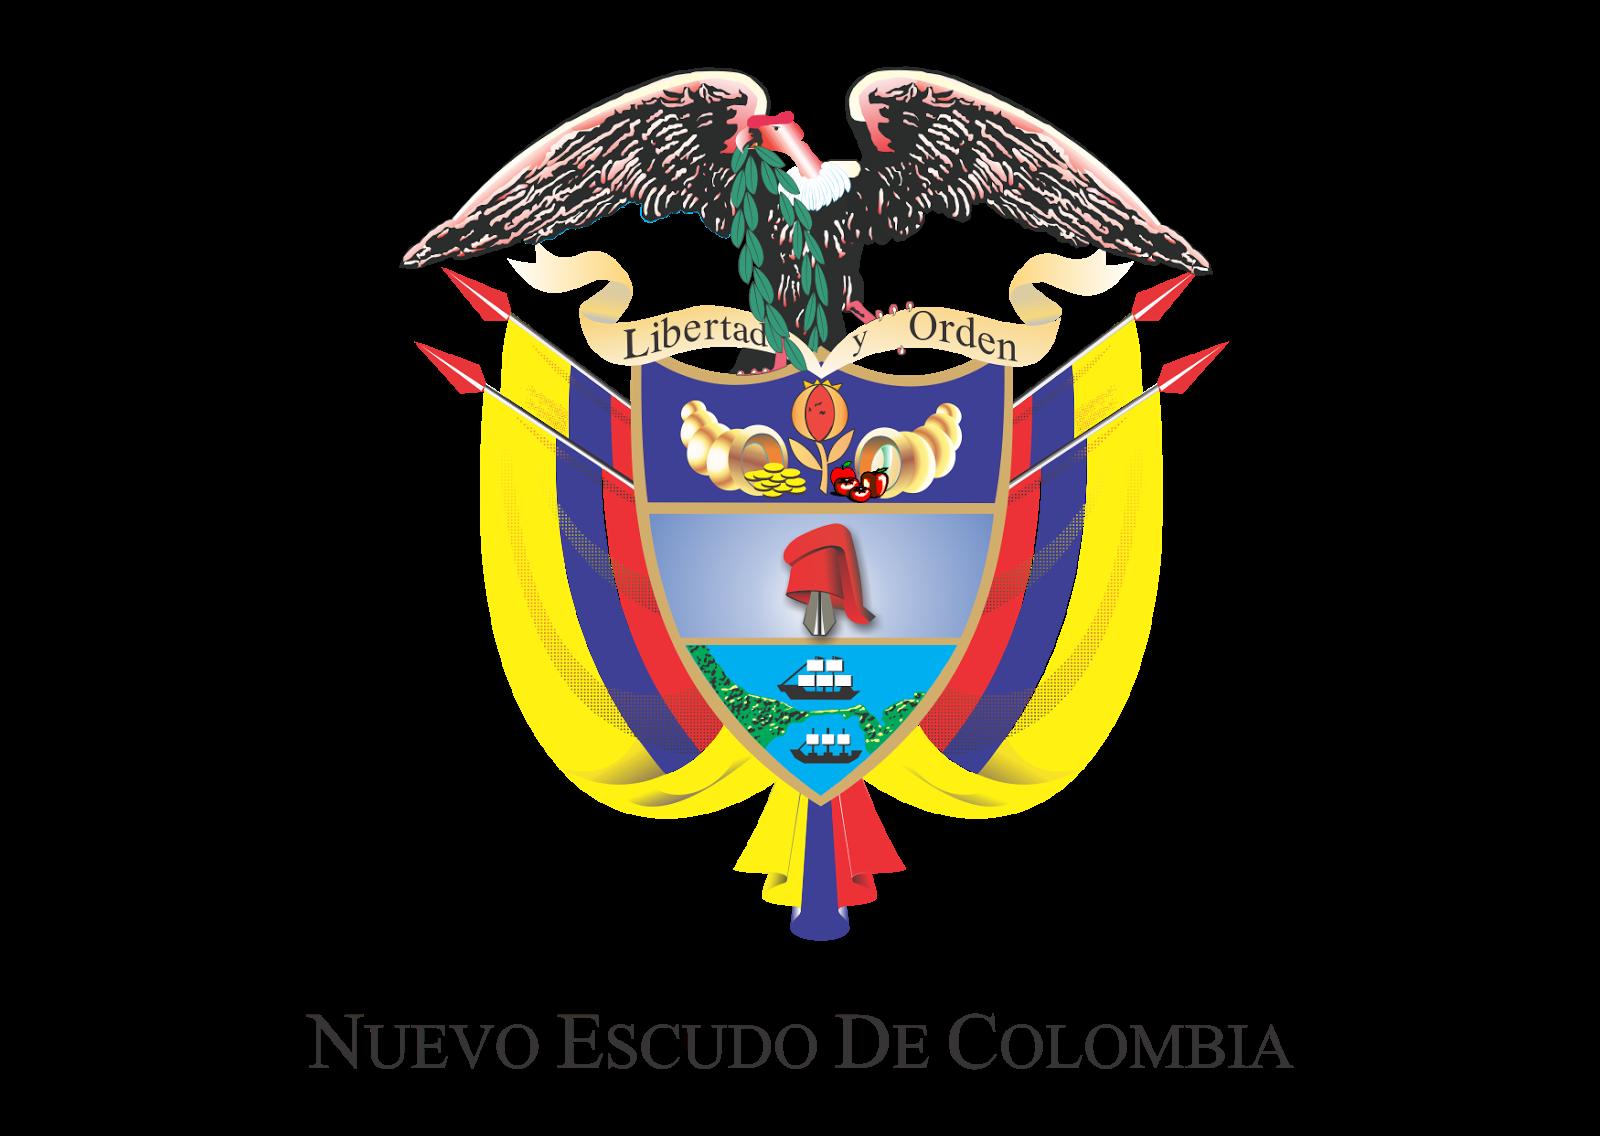 Escudo de Colombia Nuevo Logo photo - 1